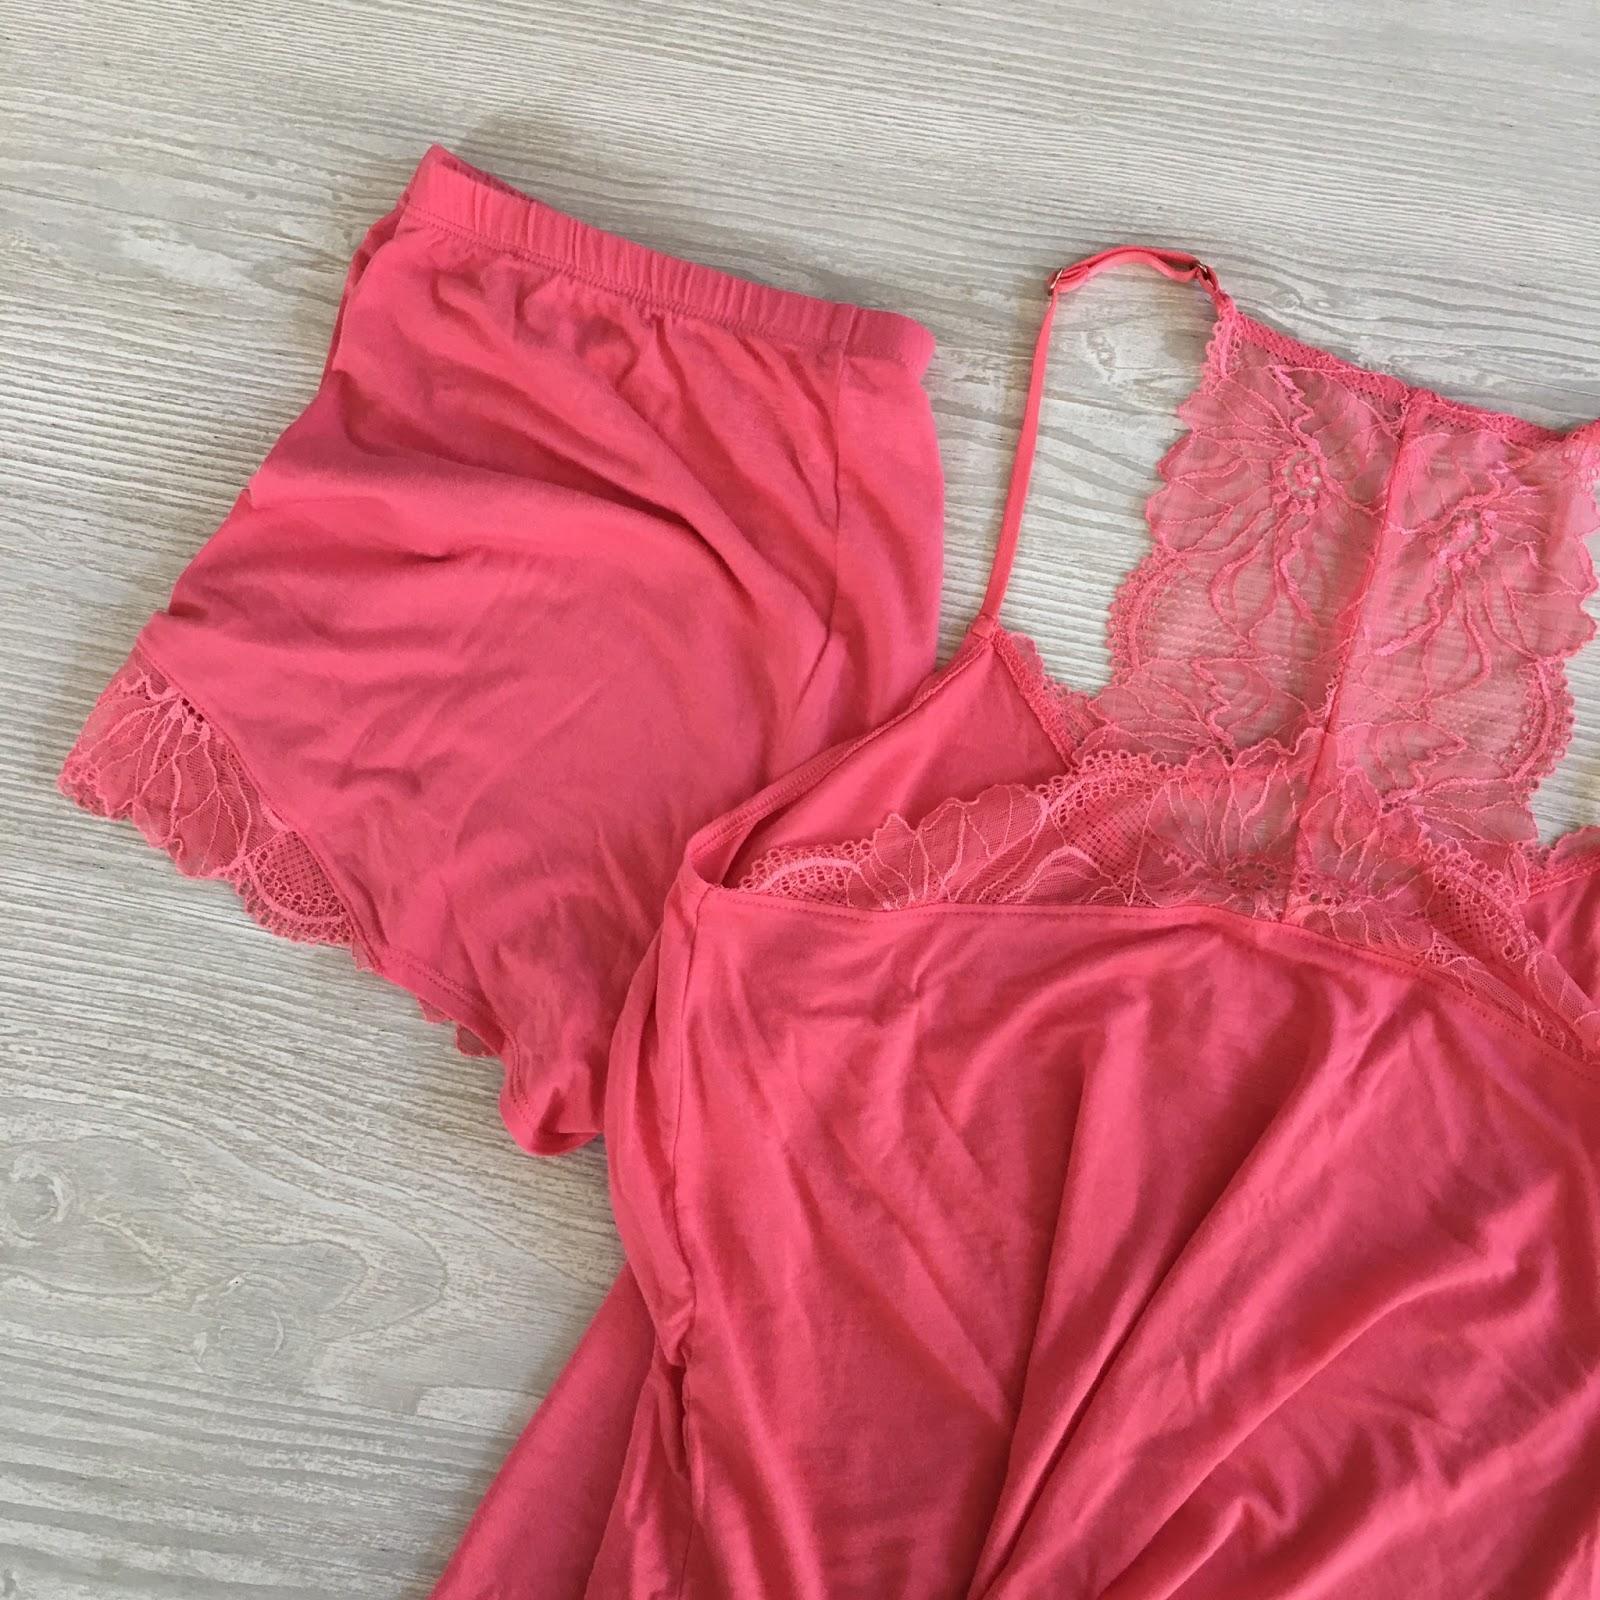 orange lace pj set